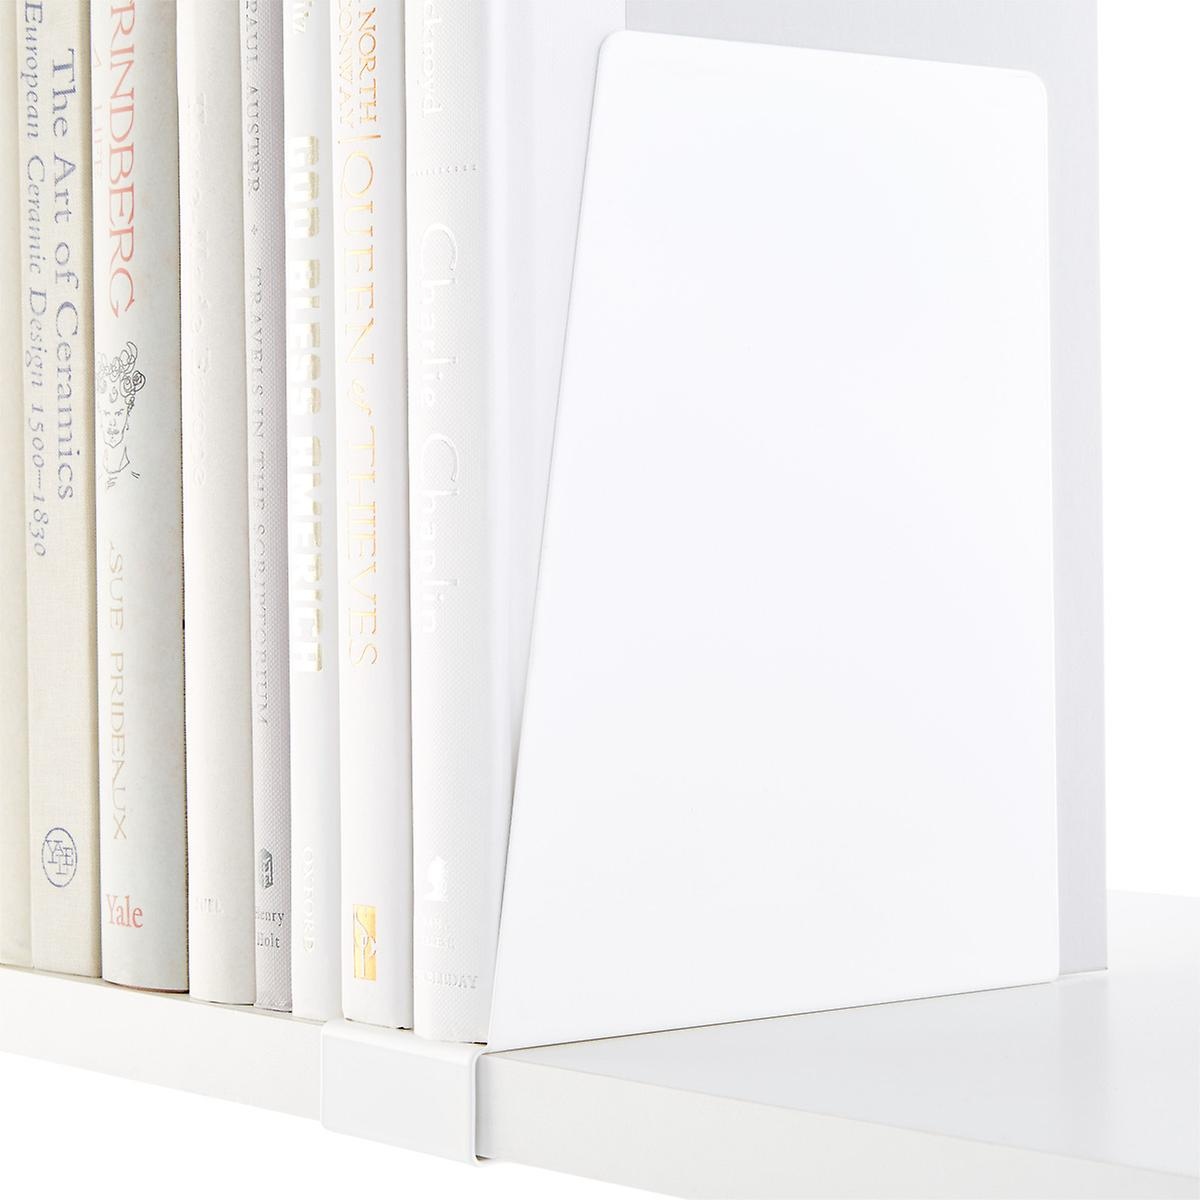 White Elfa Solid Shelf Book Supports